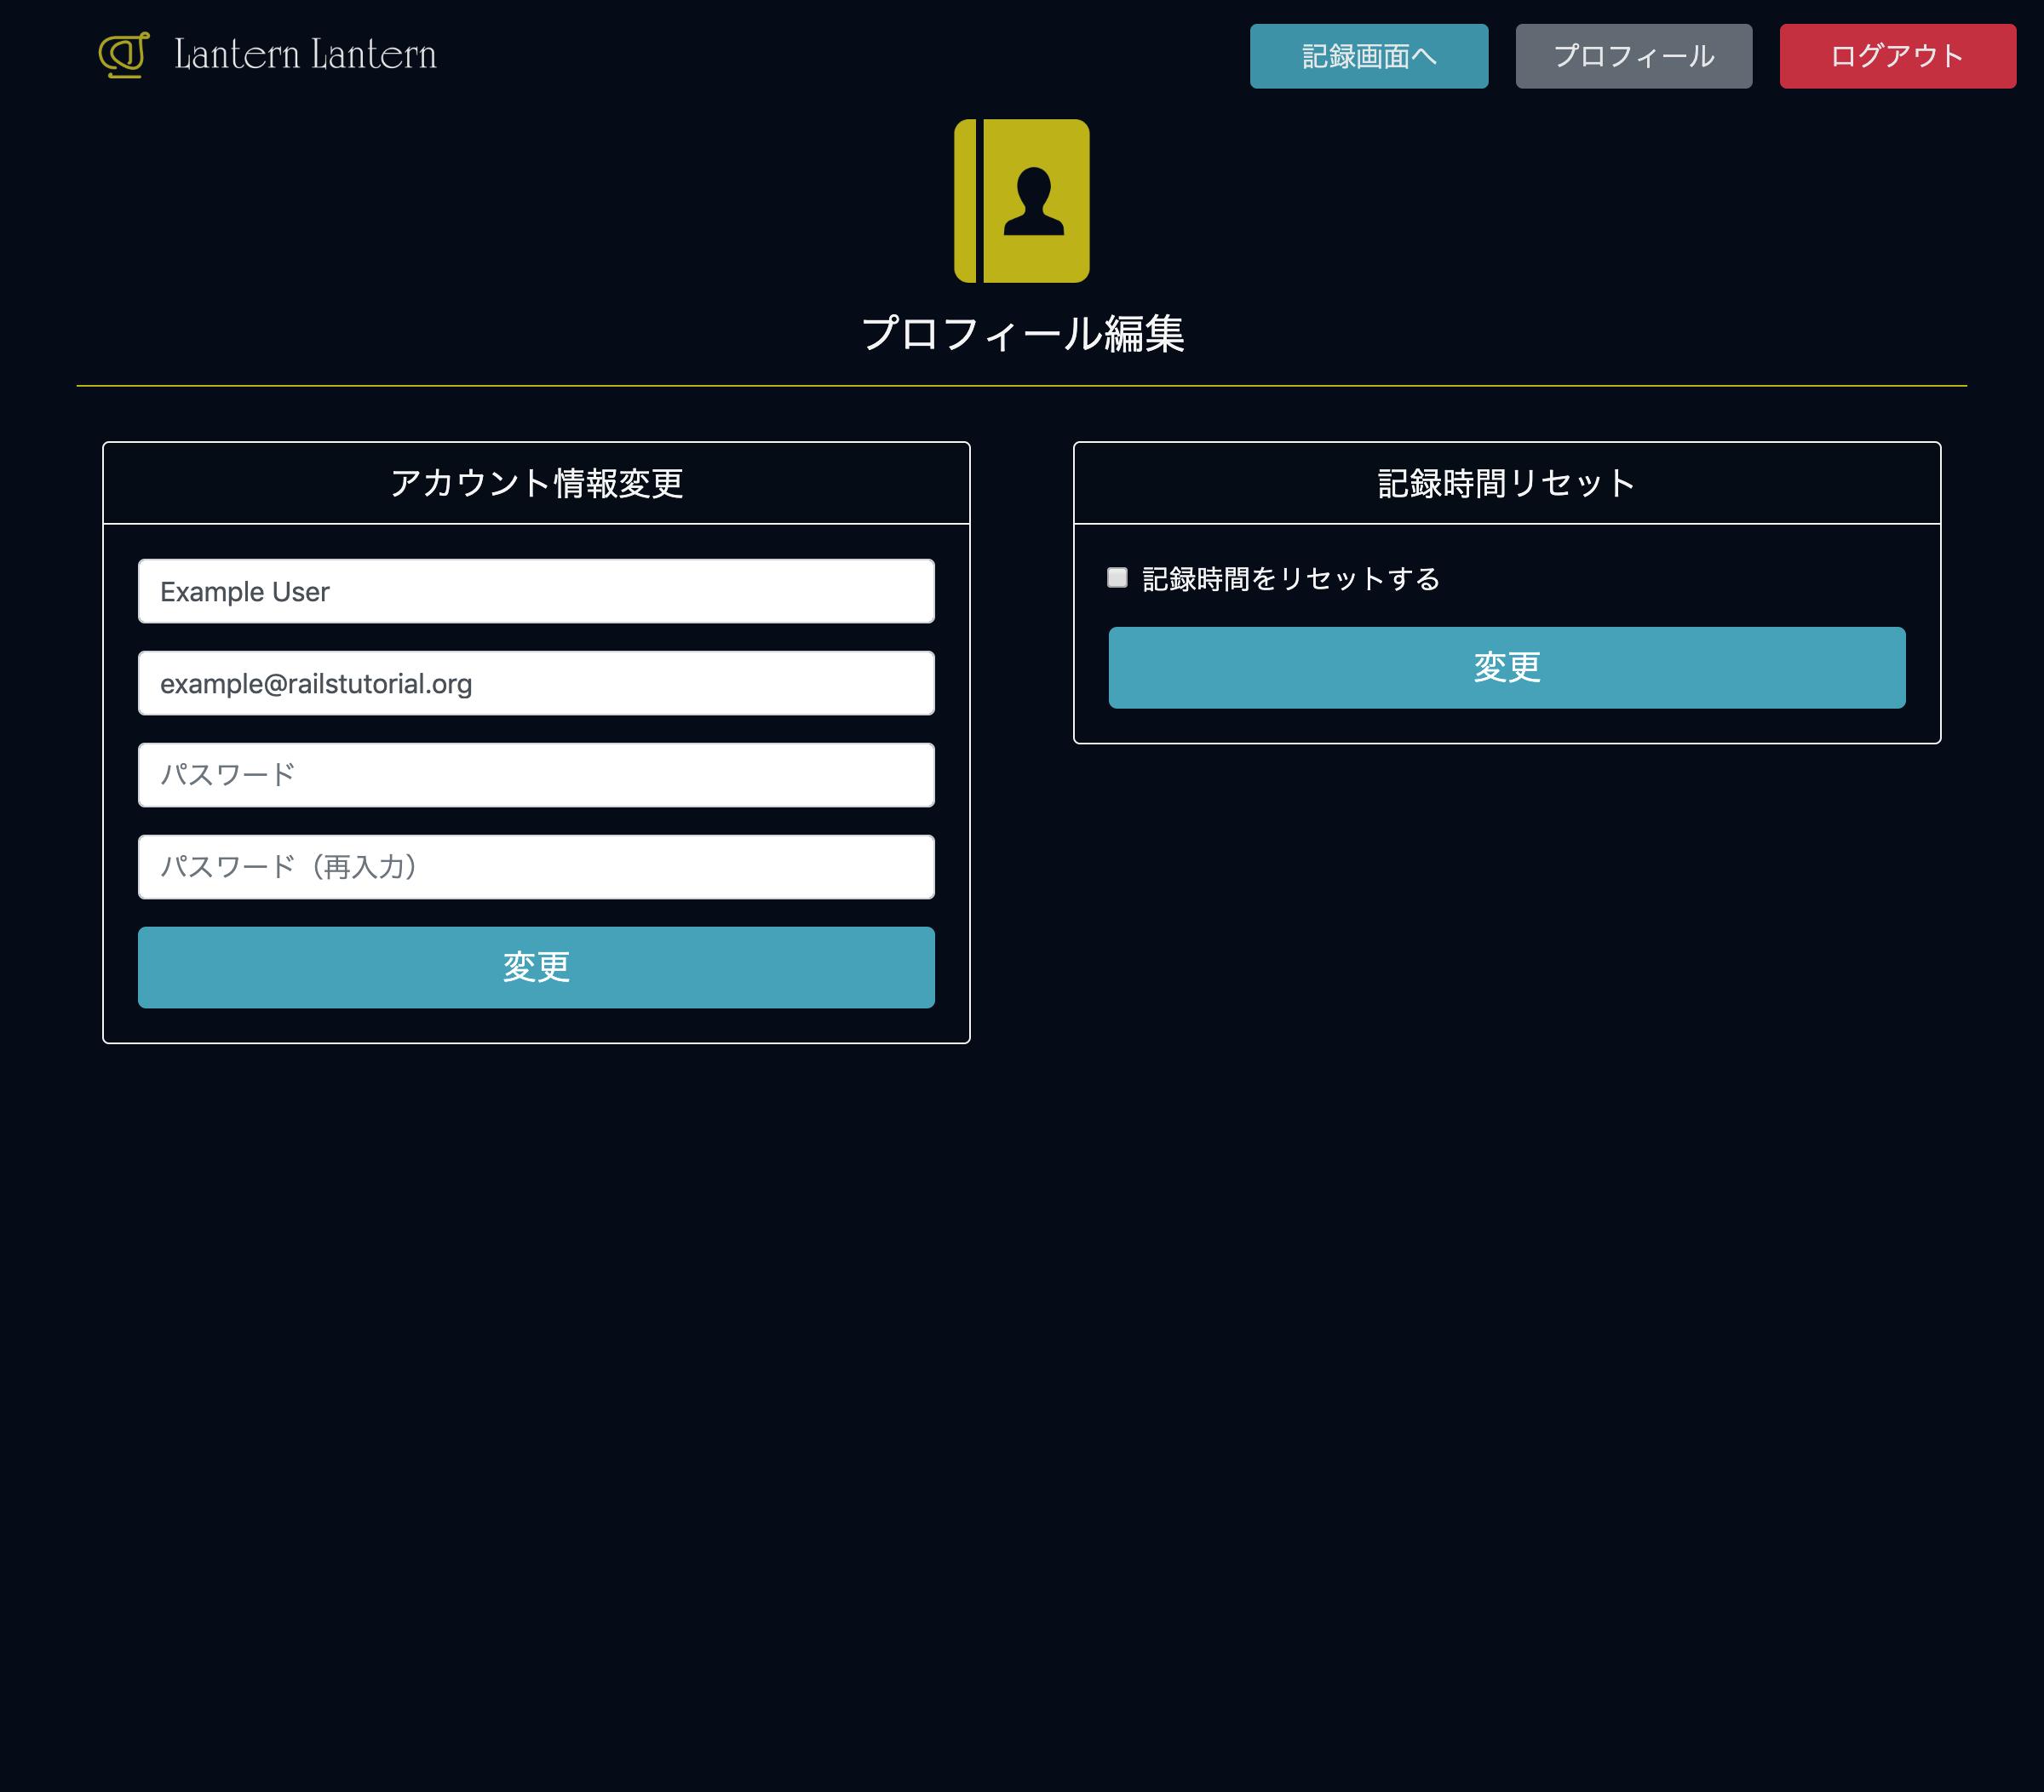 lantern_lantern_profile.png